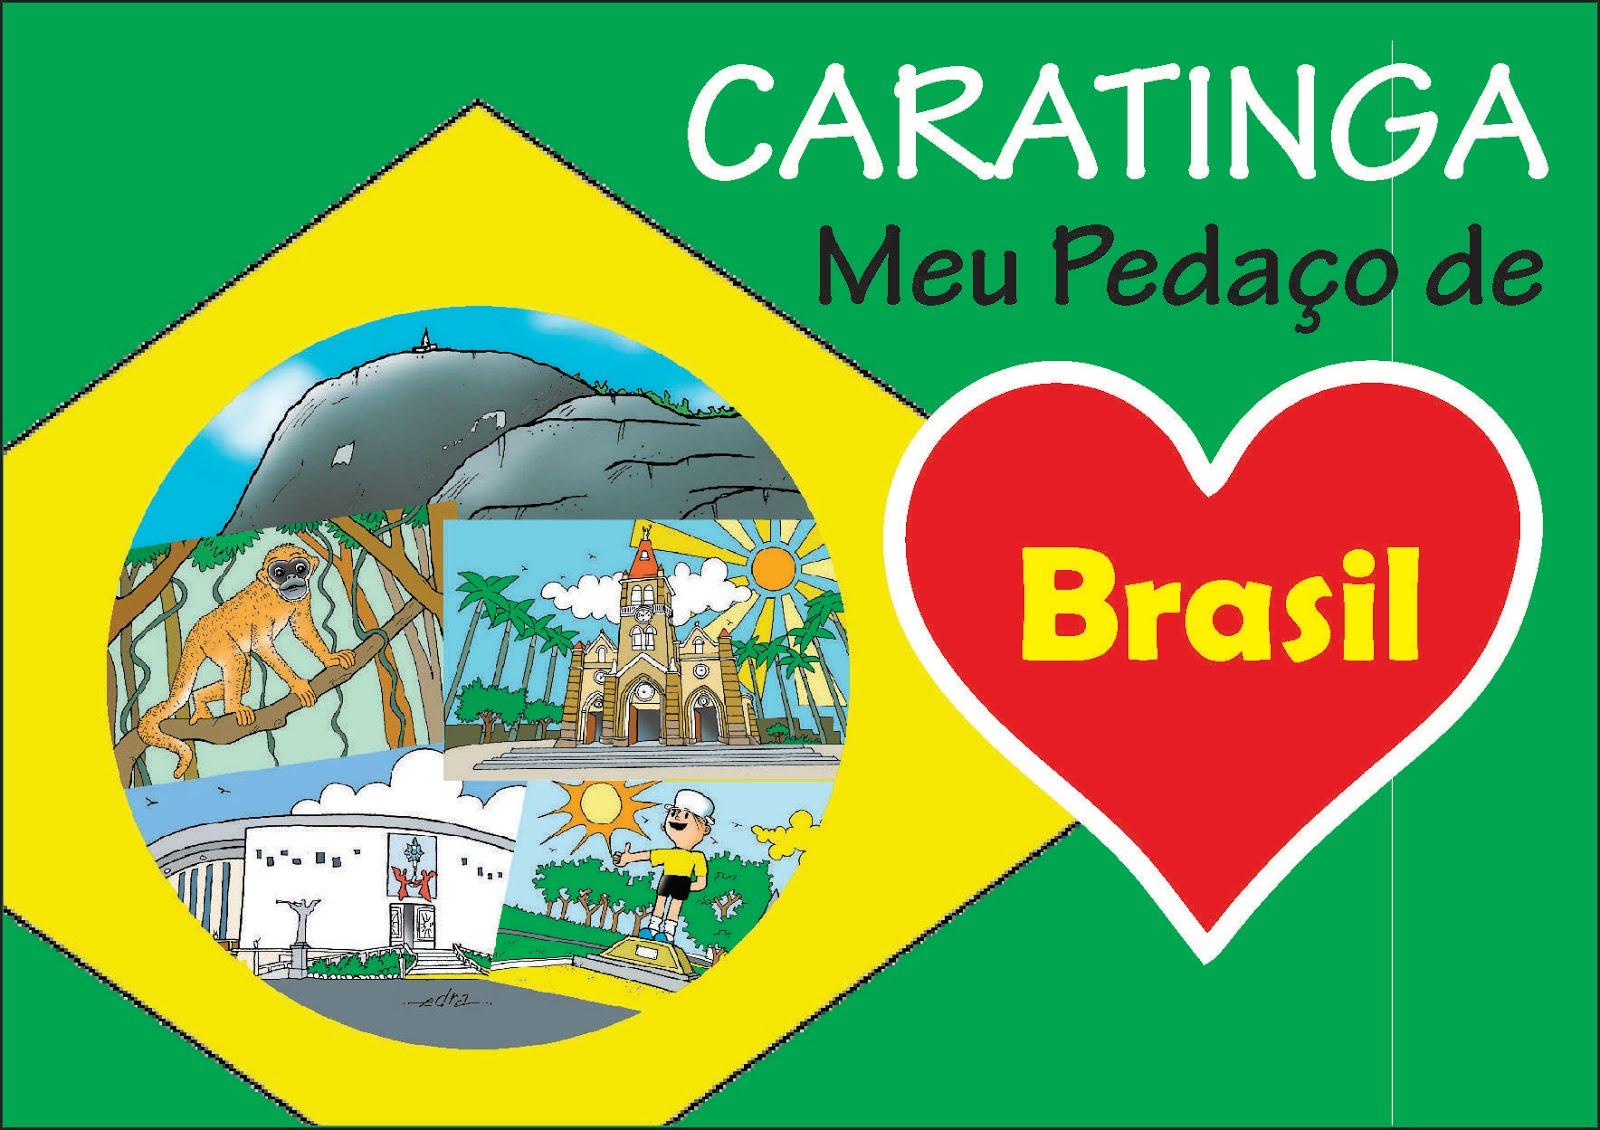 Caratinga Meu Pedaço de Brasil